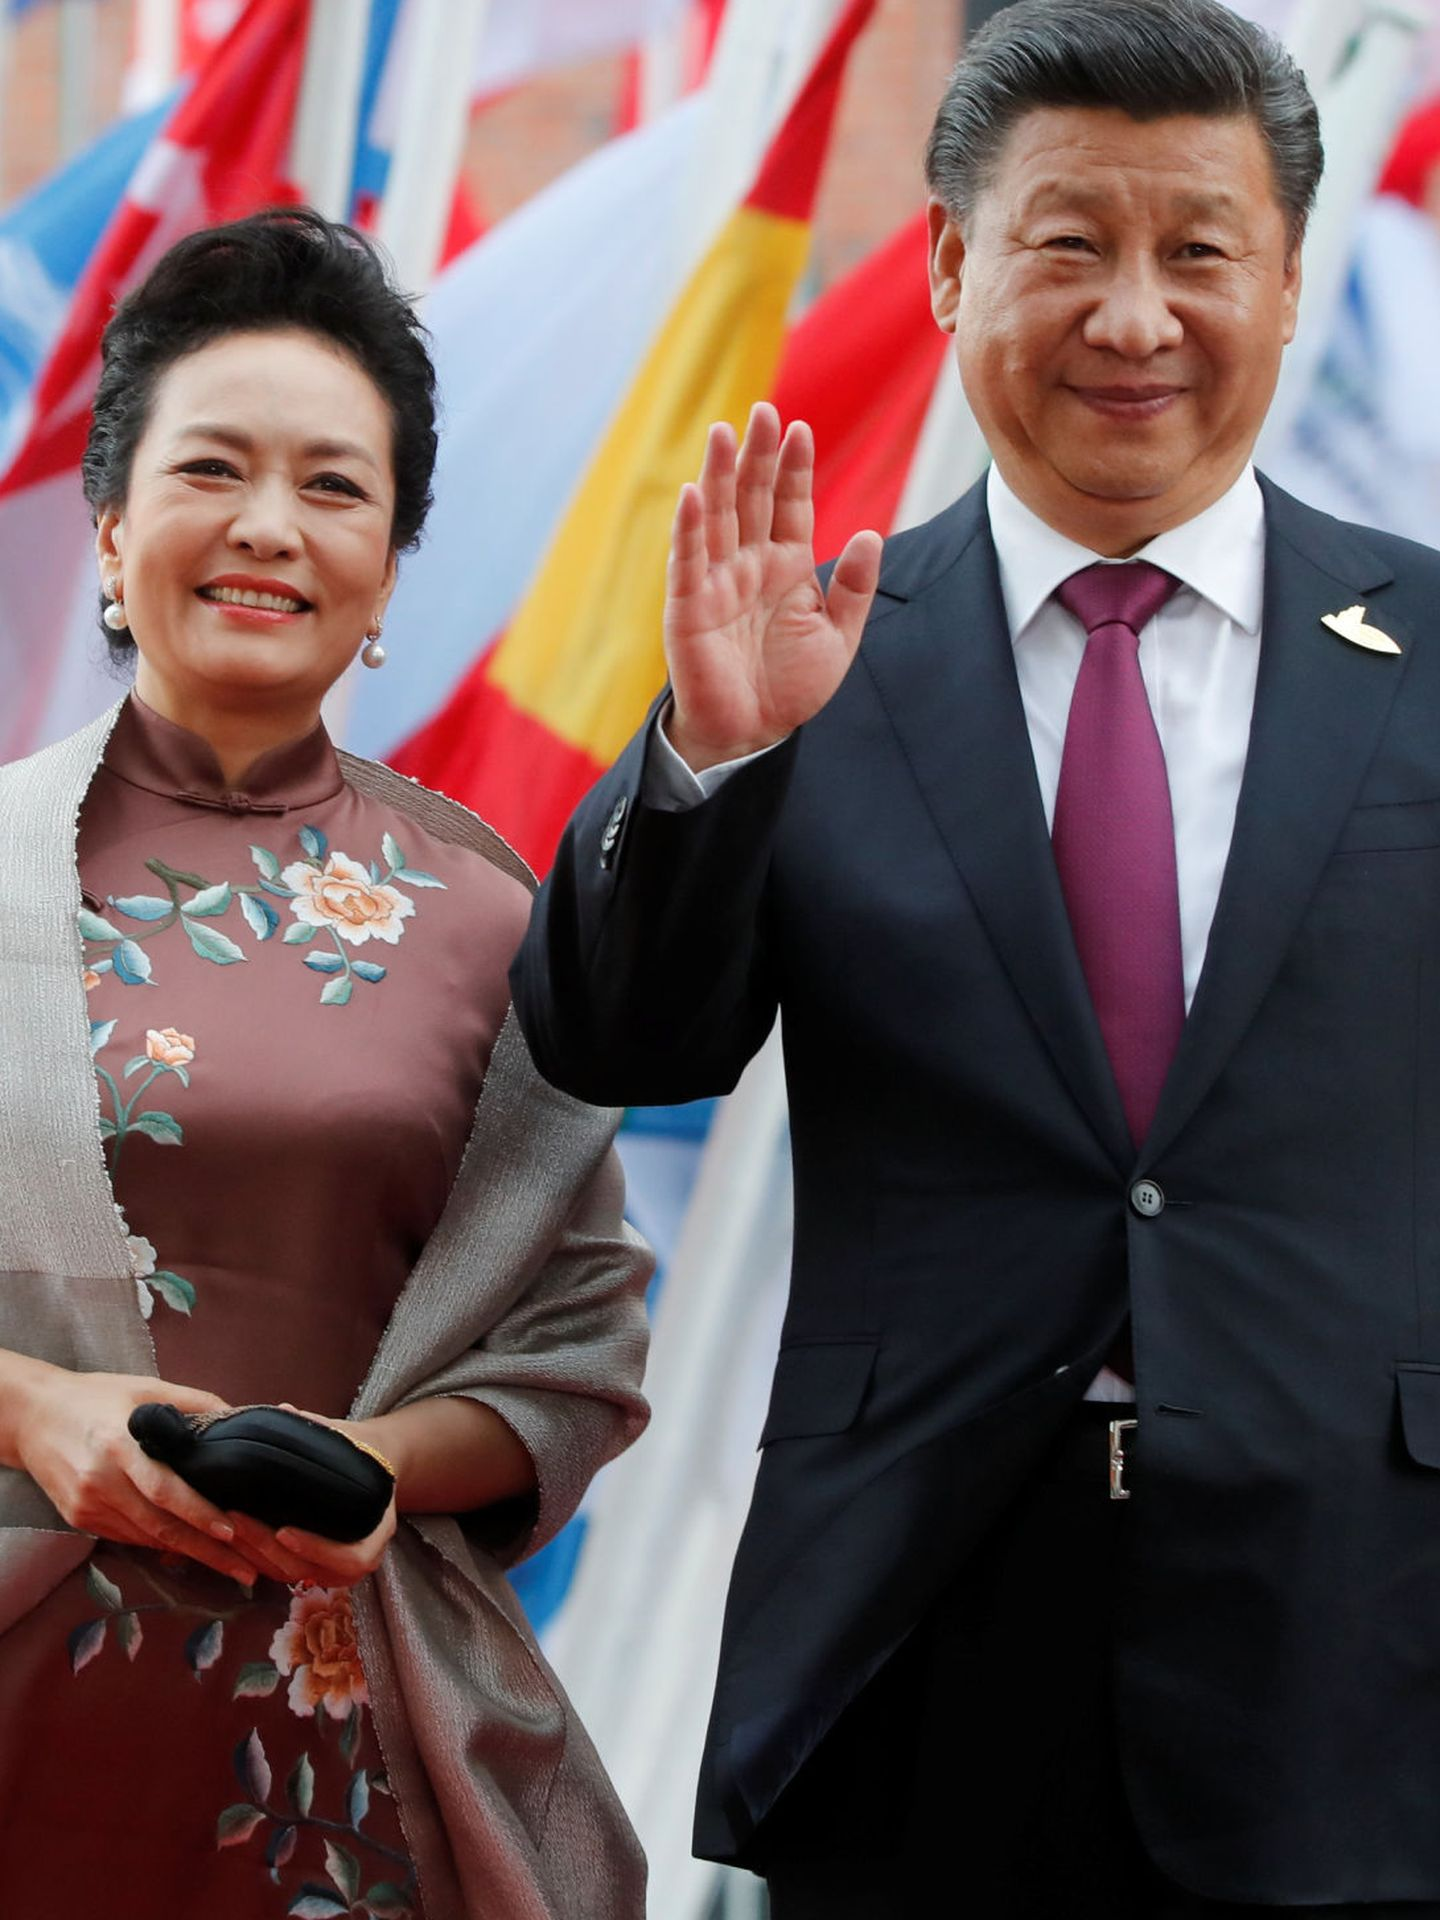 El matrimonio Jinping. (Reuters)